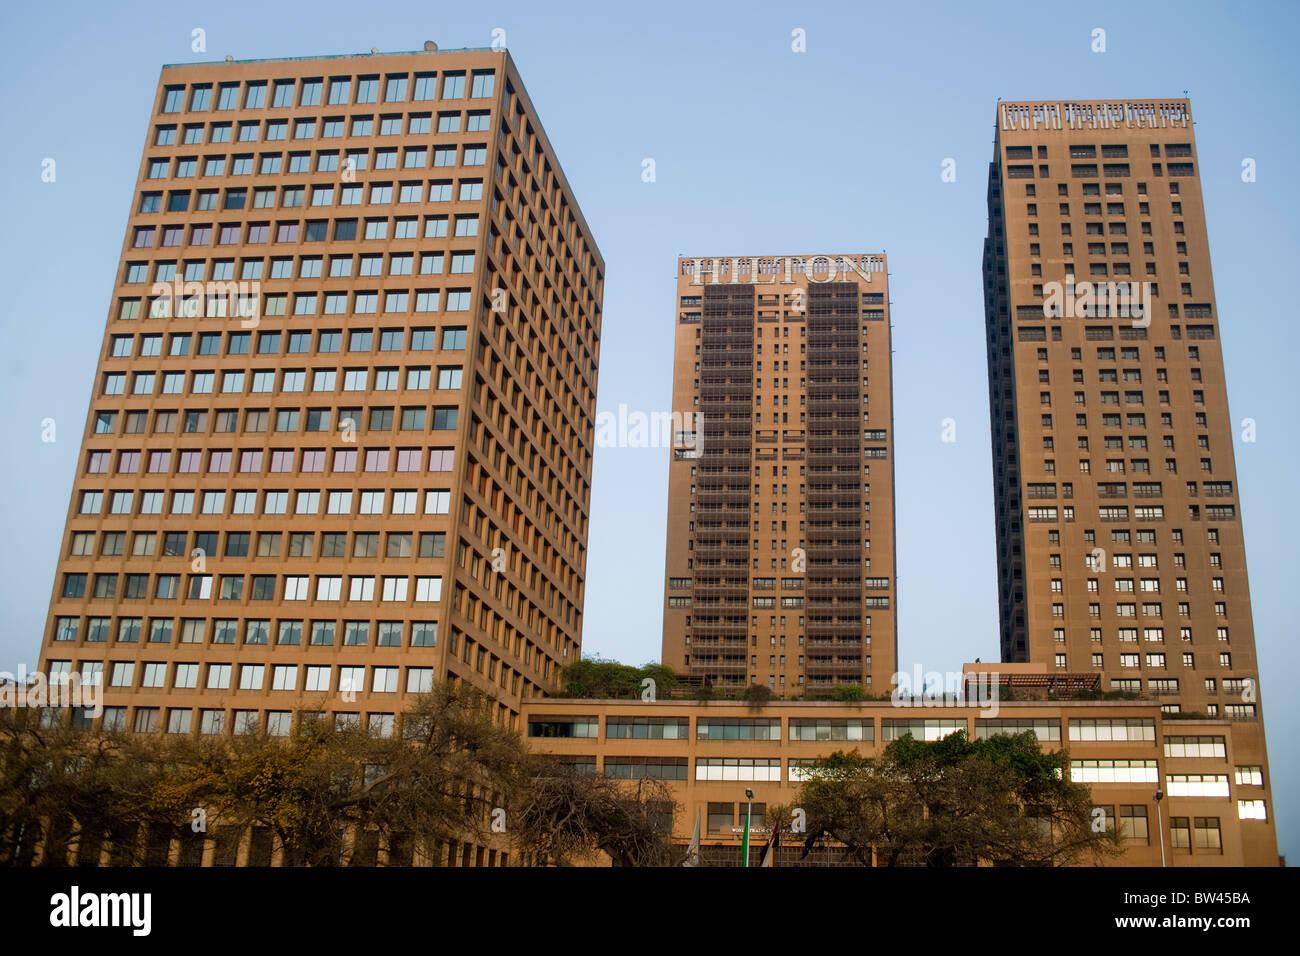 Egypt, Cairo, Hilton Cairo World Trade Center Residences - Stock Image